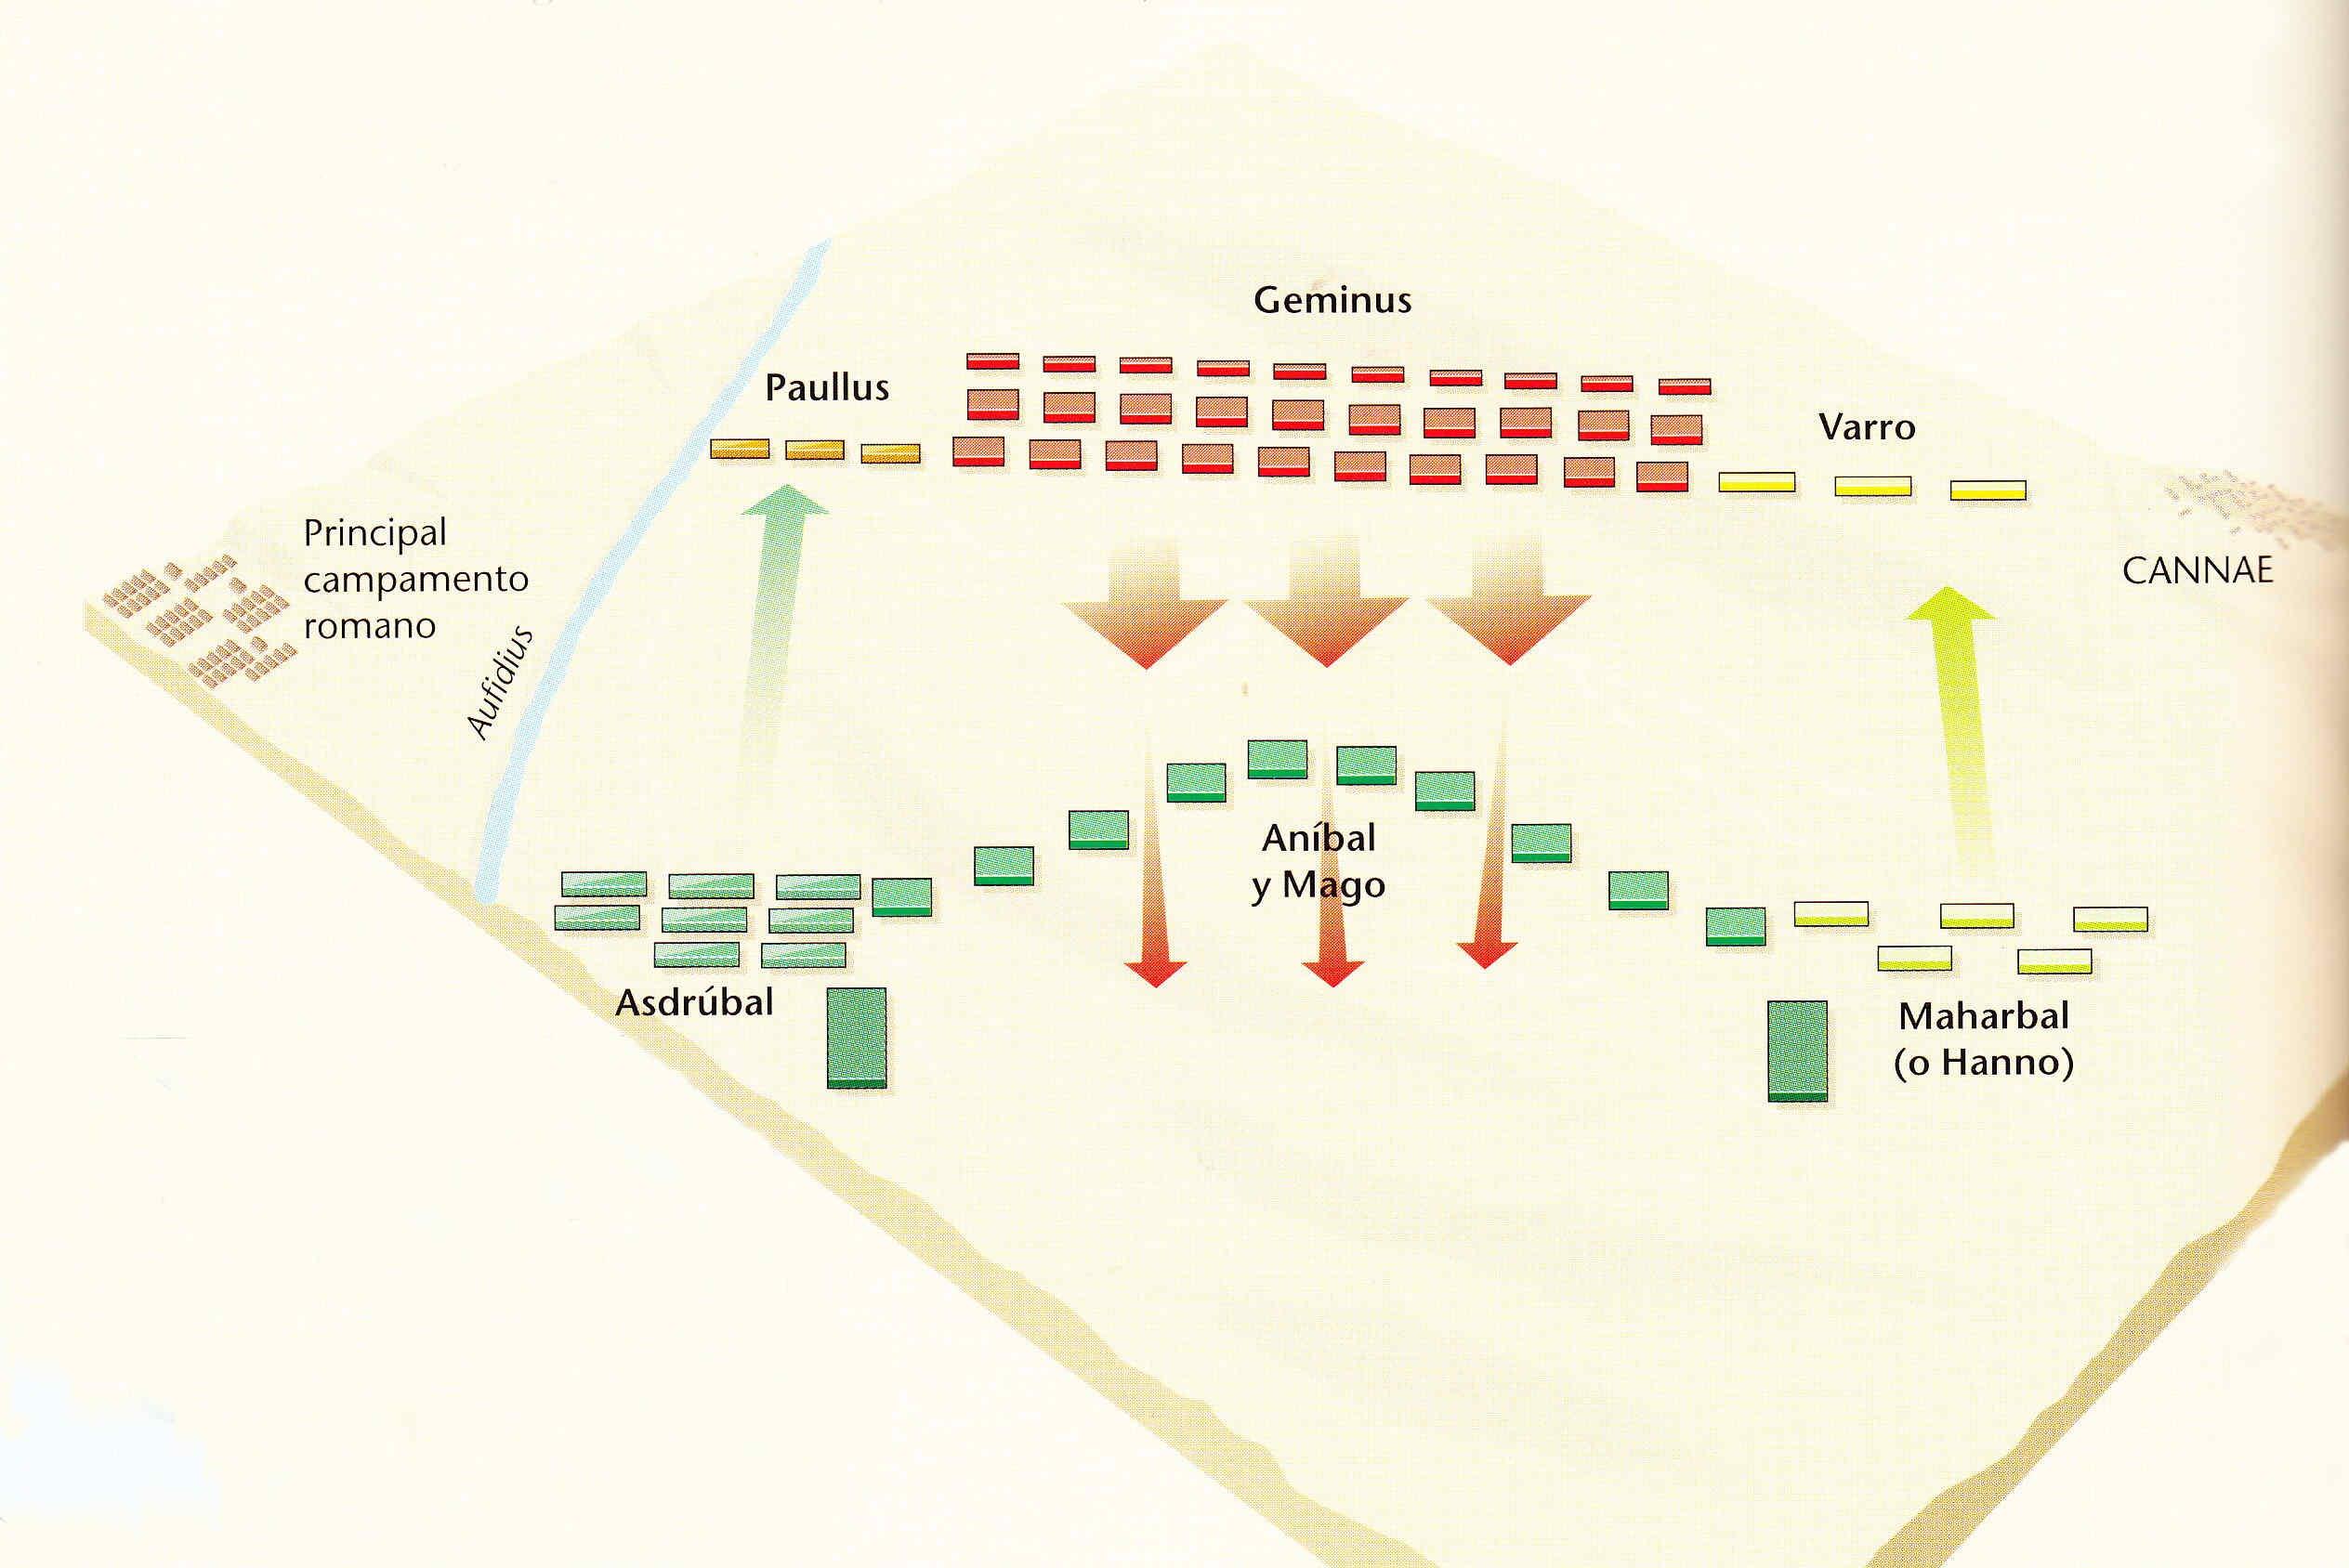 Egipto Antiguo 137 La batalla de Cannas de Aníbal